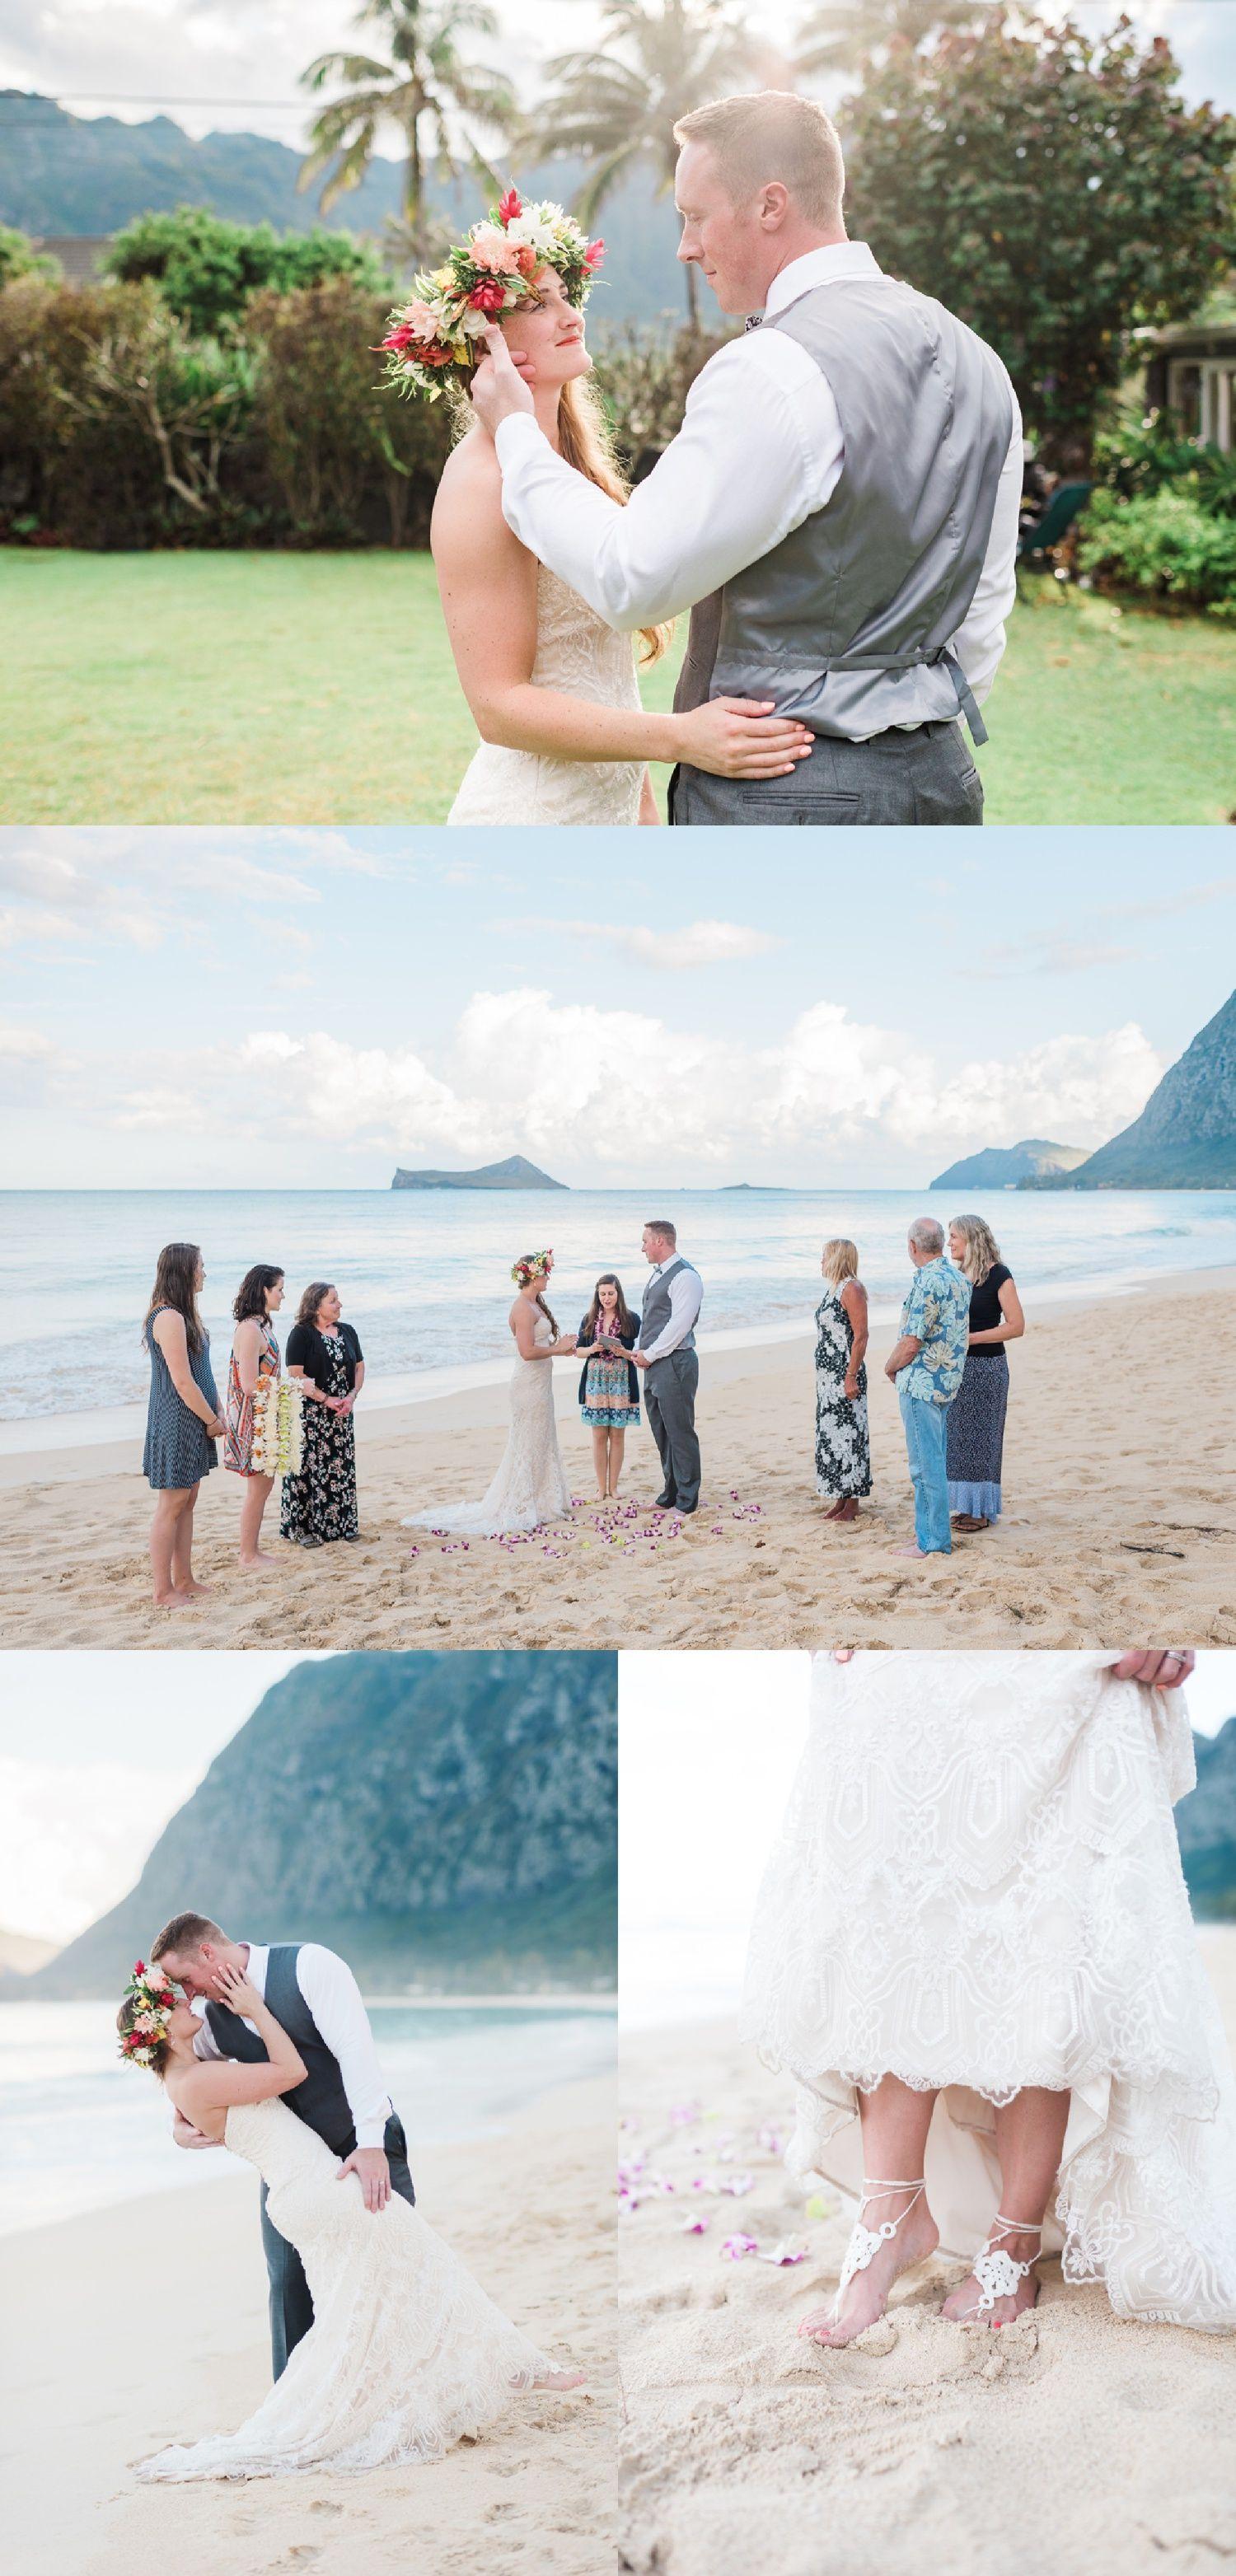 Kristal u sean at waimanalo beach u oahu elopement photographer my